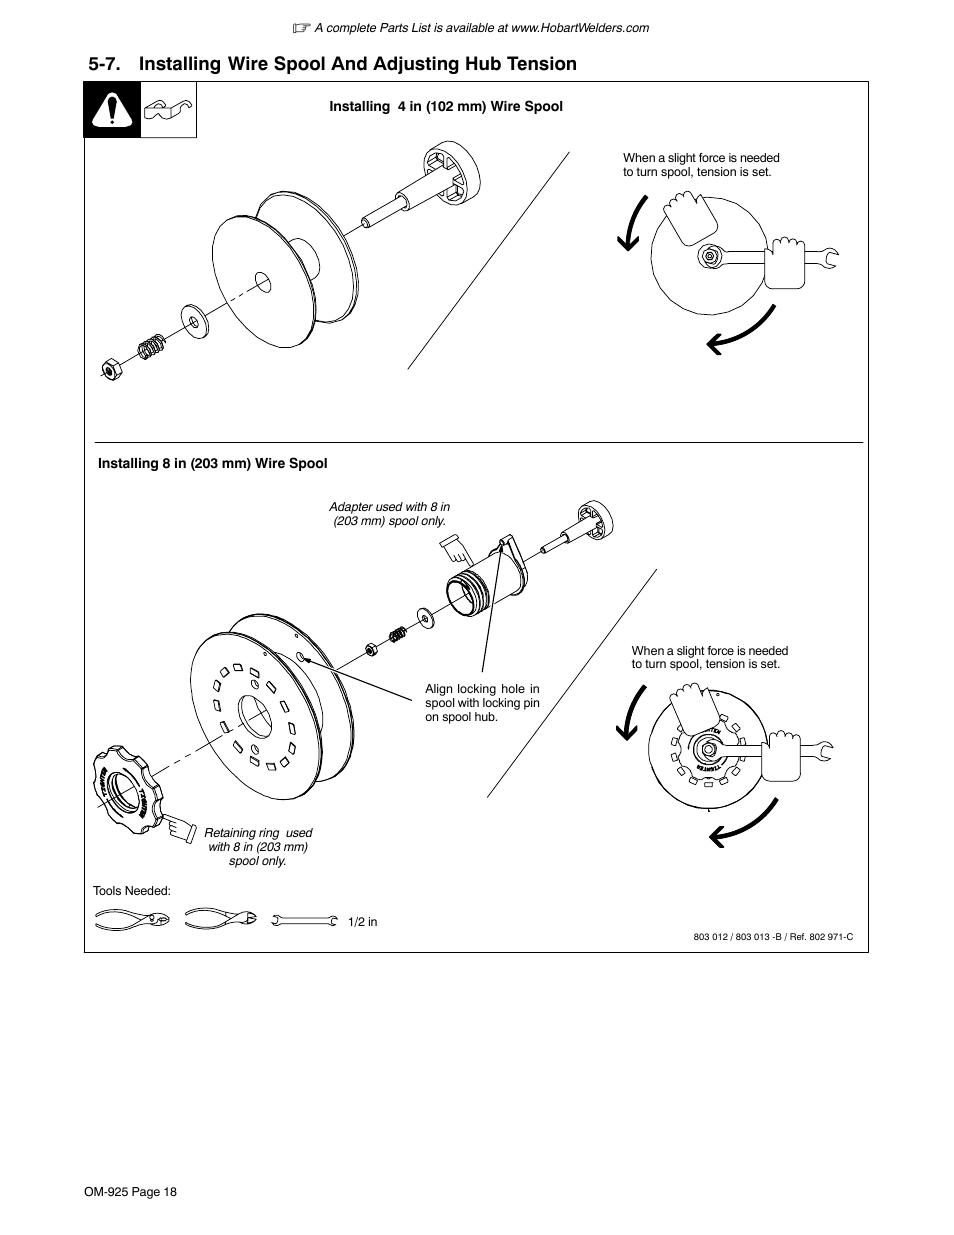 7. installing wire spool and adjusting hub tension | Hobart Welding ...